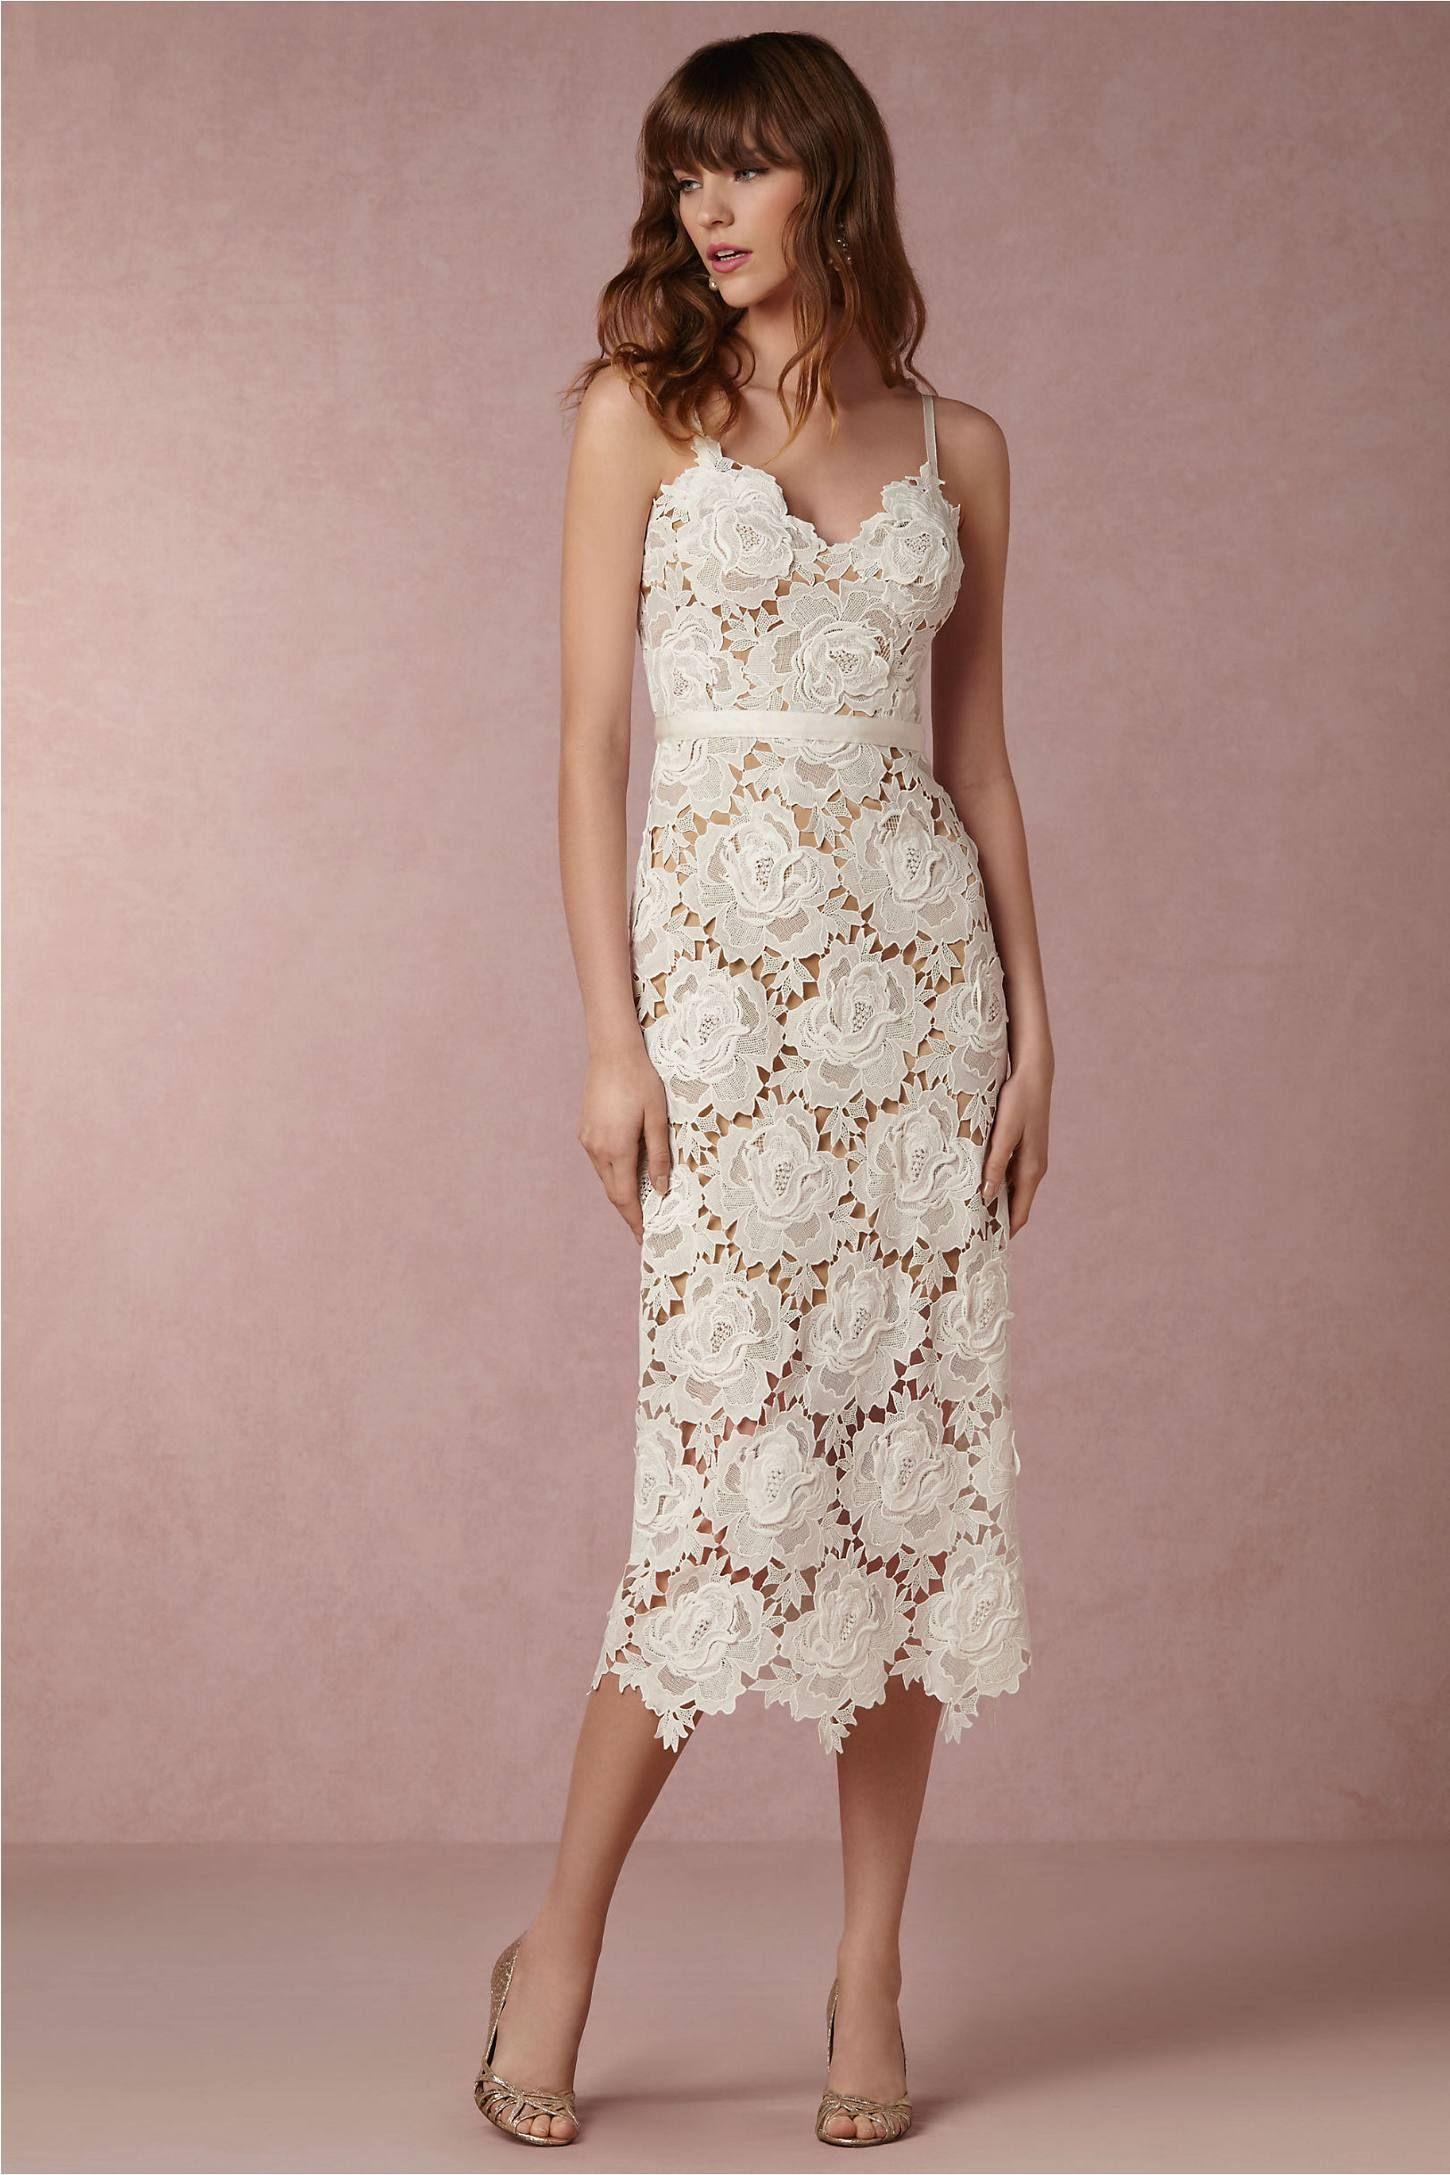 Frida Dress | Pinterest | Blanco y Fiestas